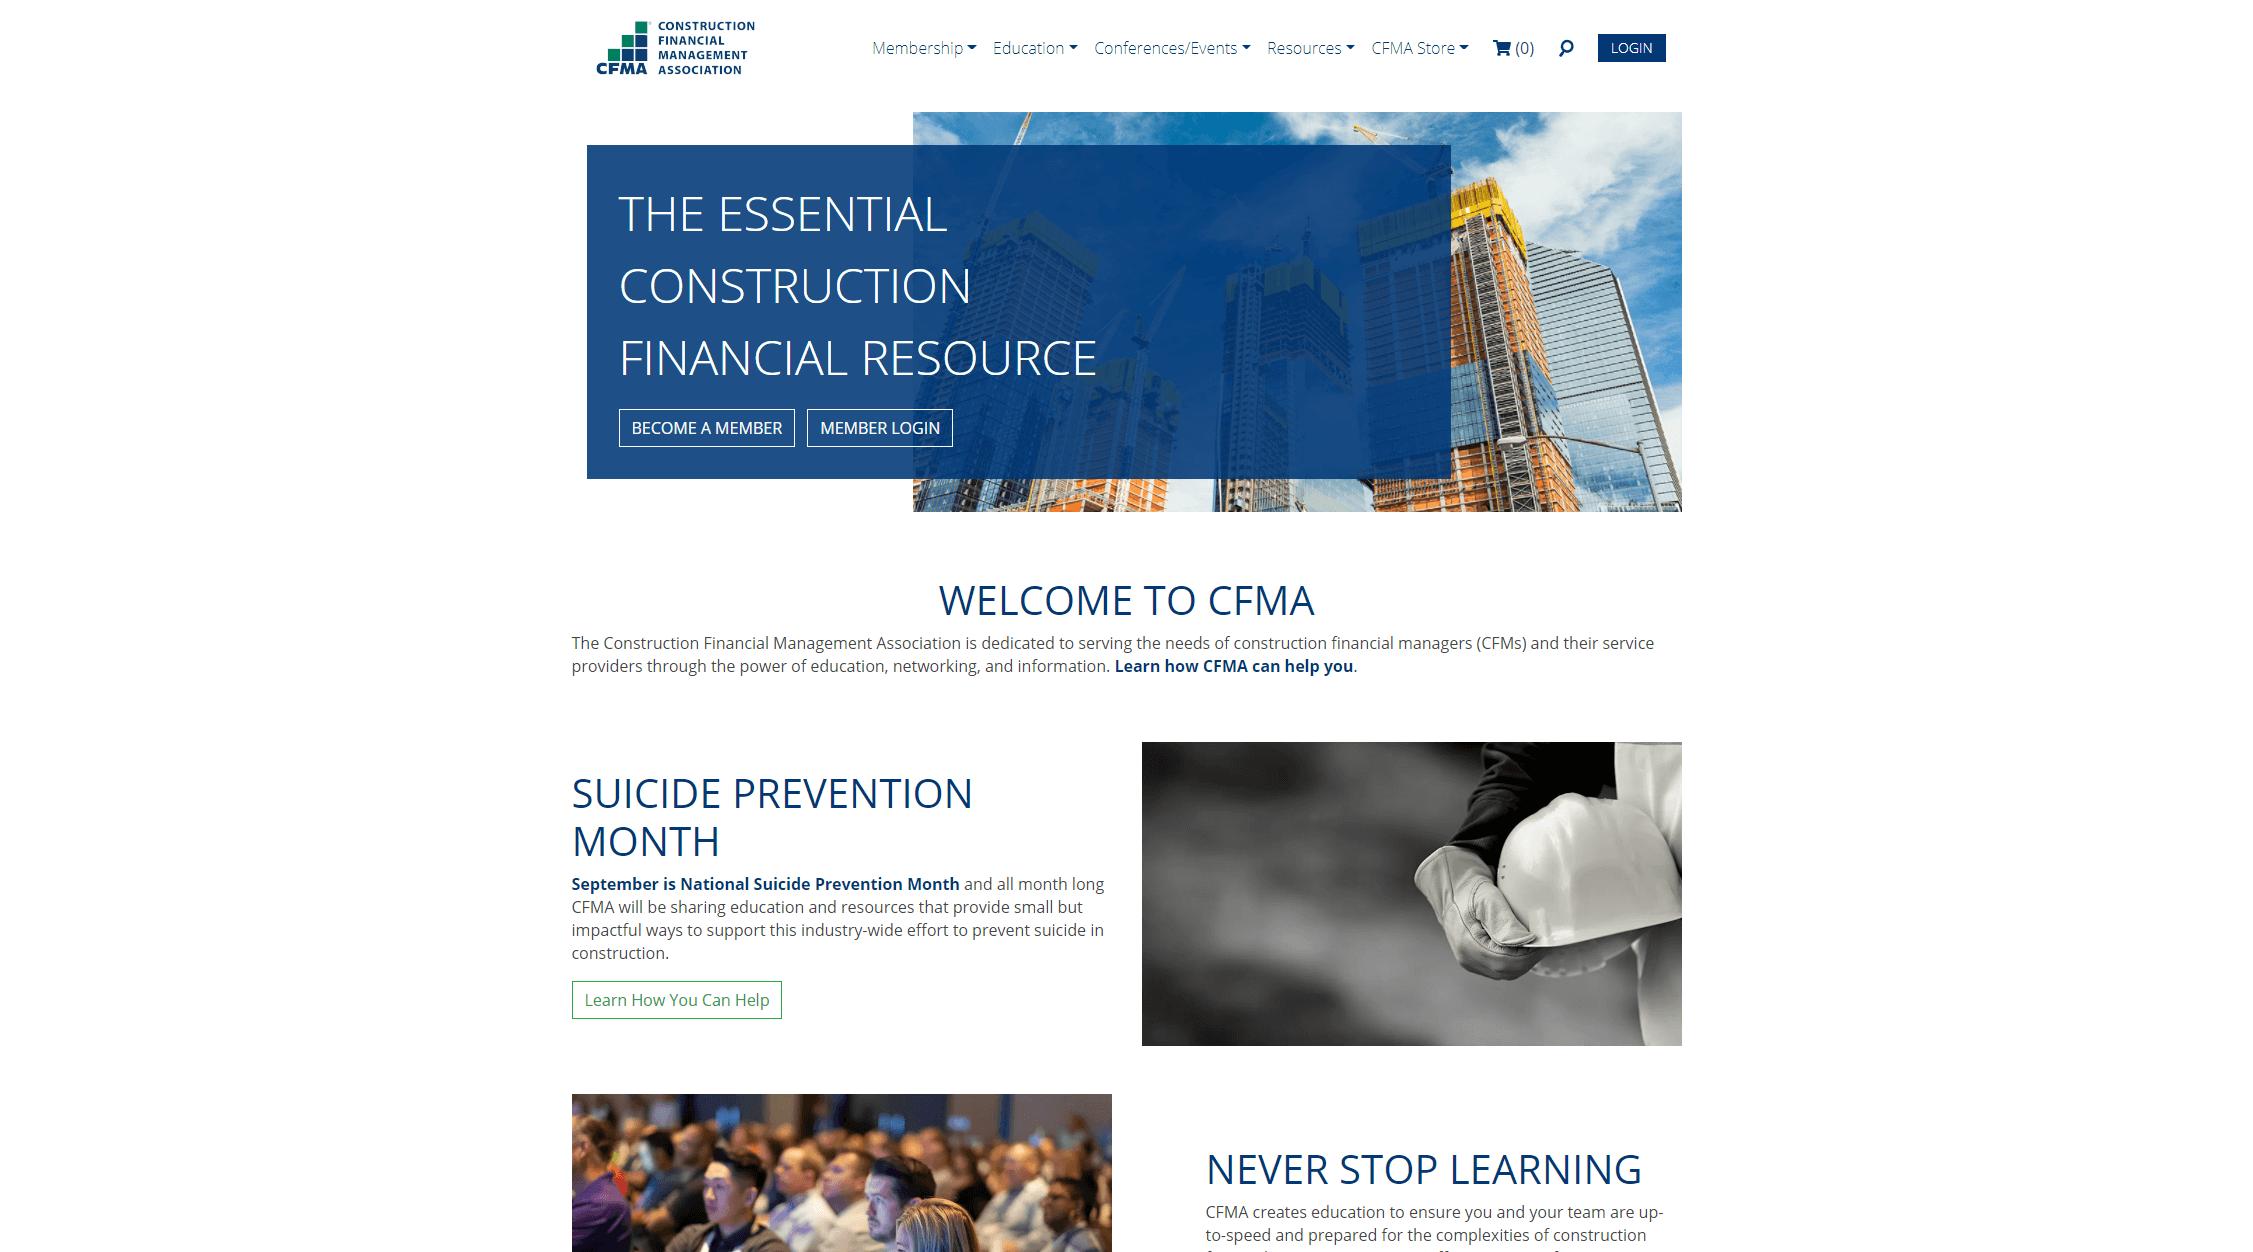 cfma.org